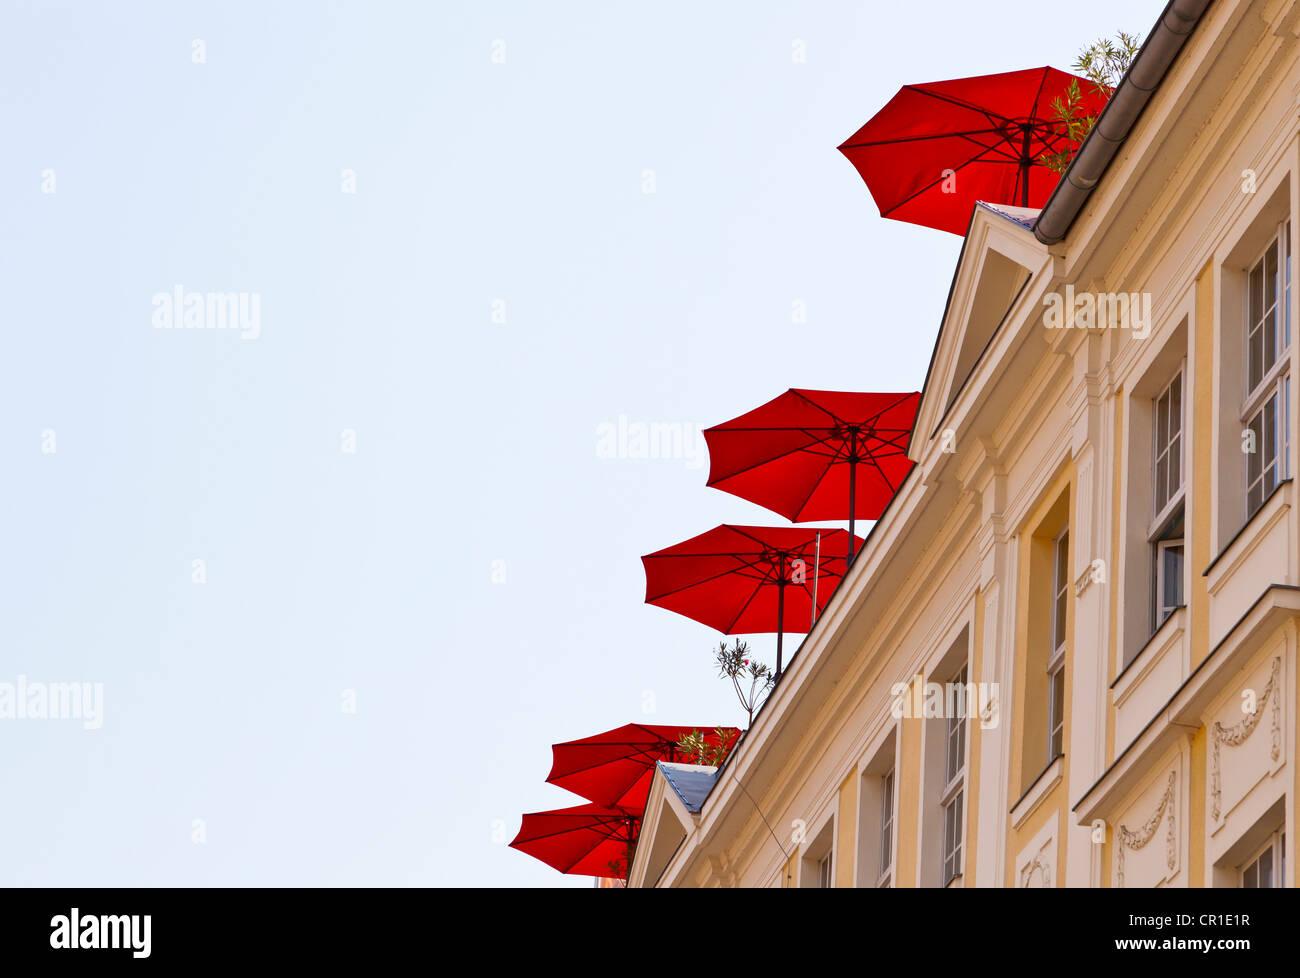 Red umbrellas on a roof terrace, Potsdam, Brandenburg, Germany, Europe Stock Photo